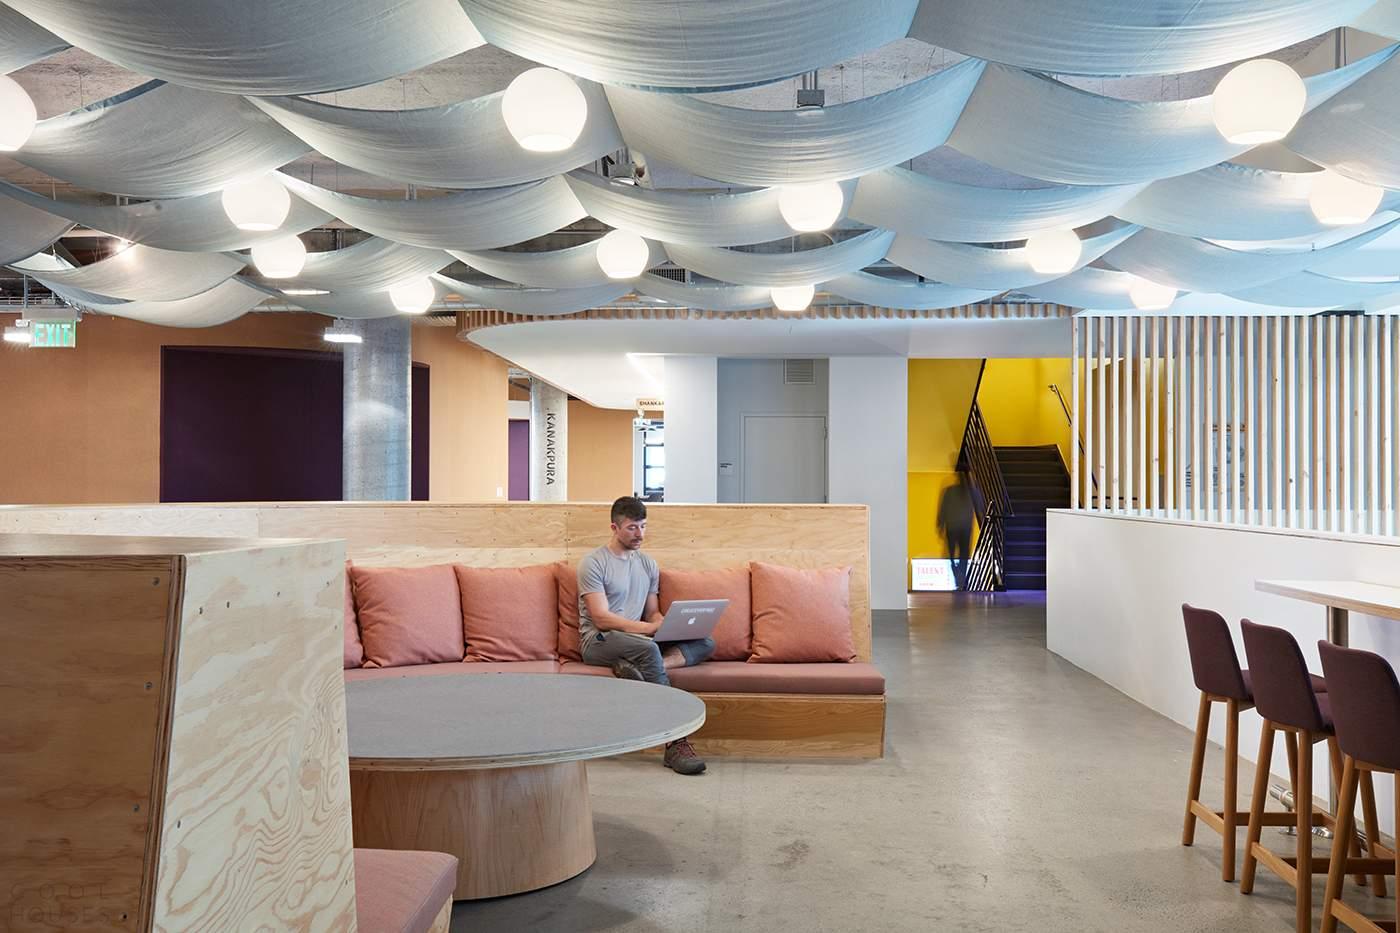 Новый офис интернет-сервиса Airbnb в Сан-Франциско, США